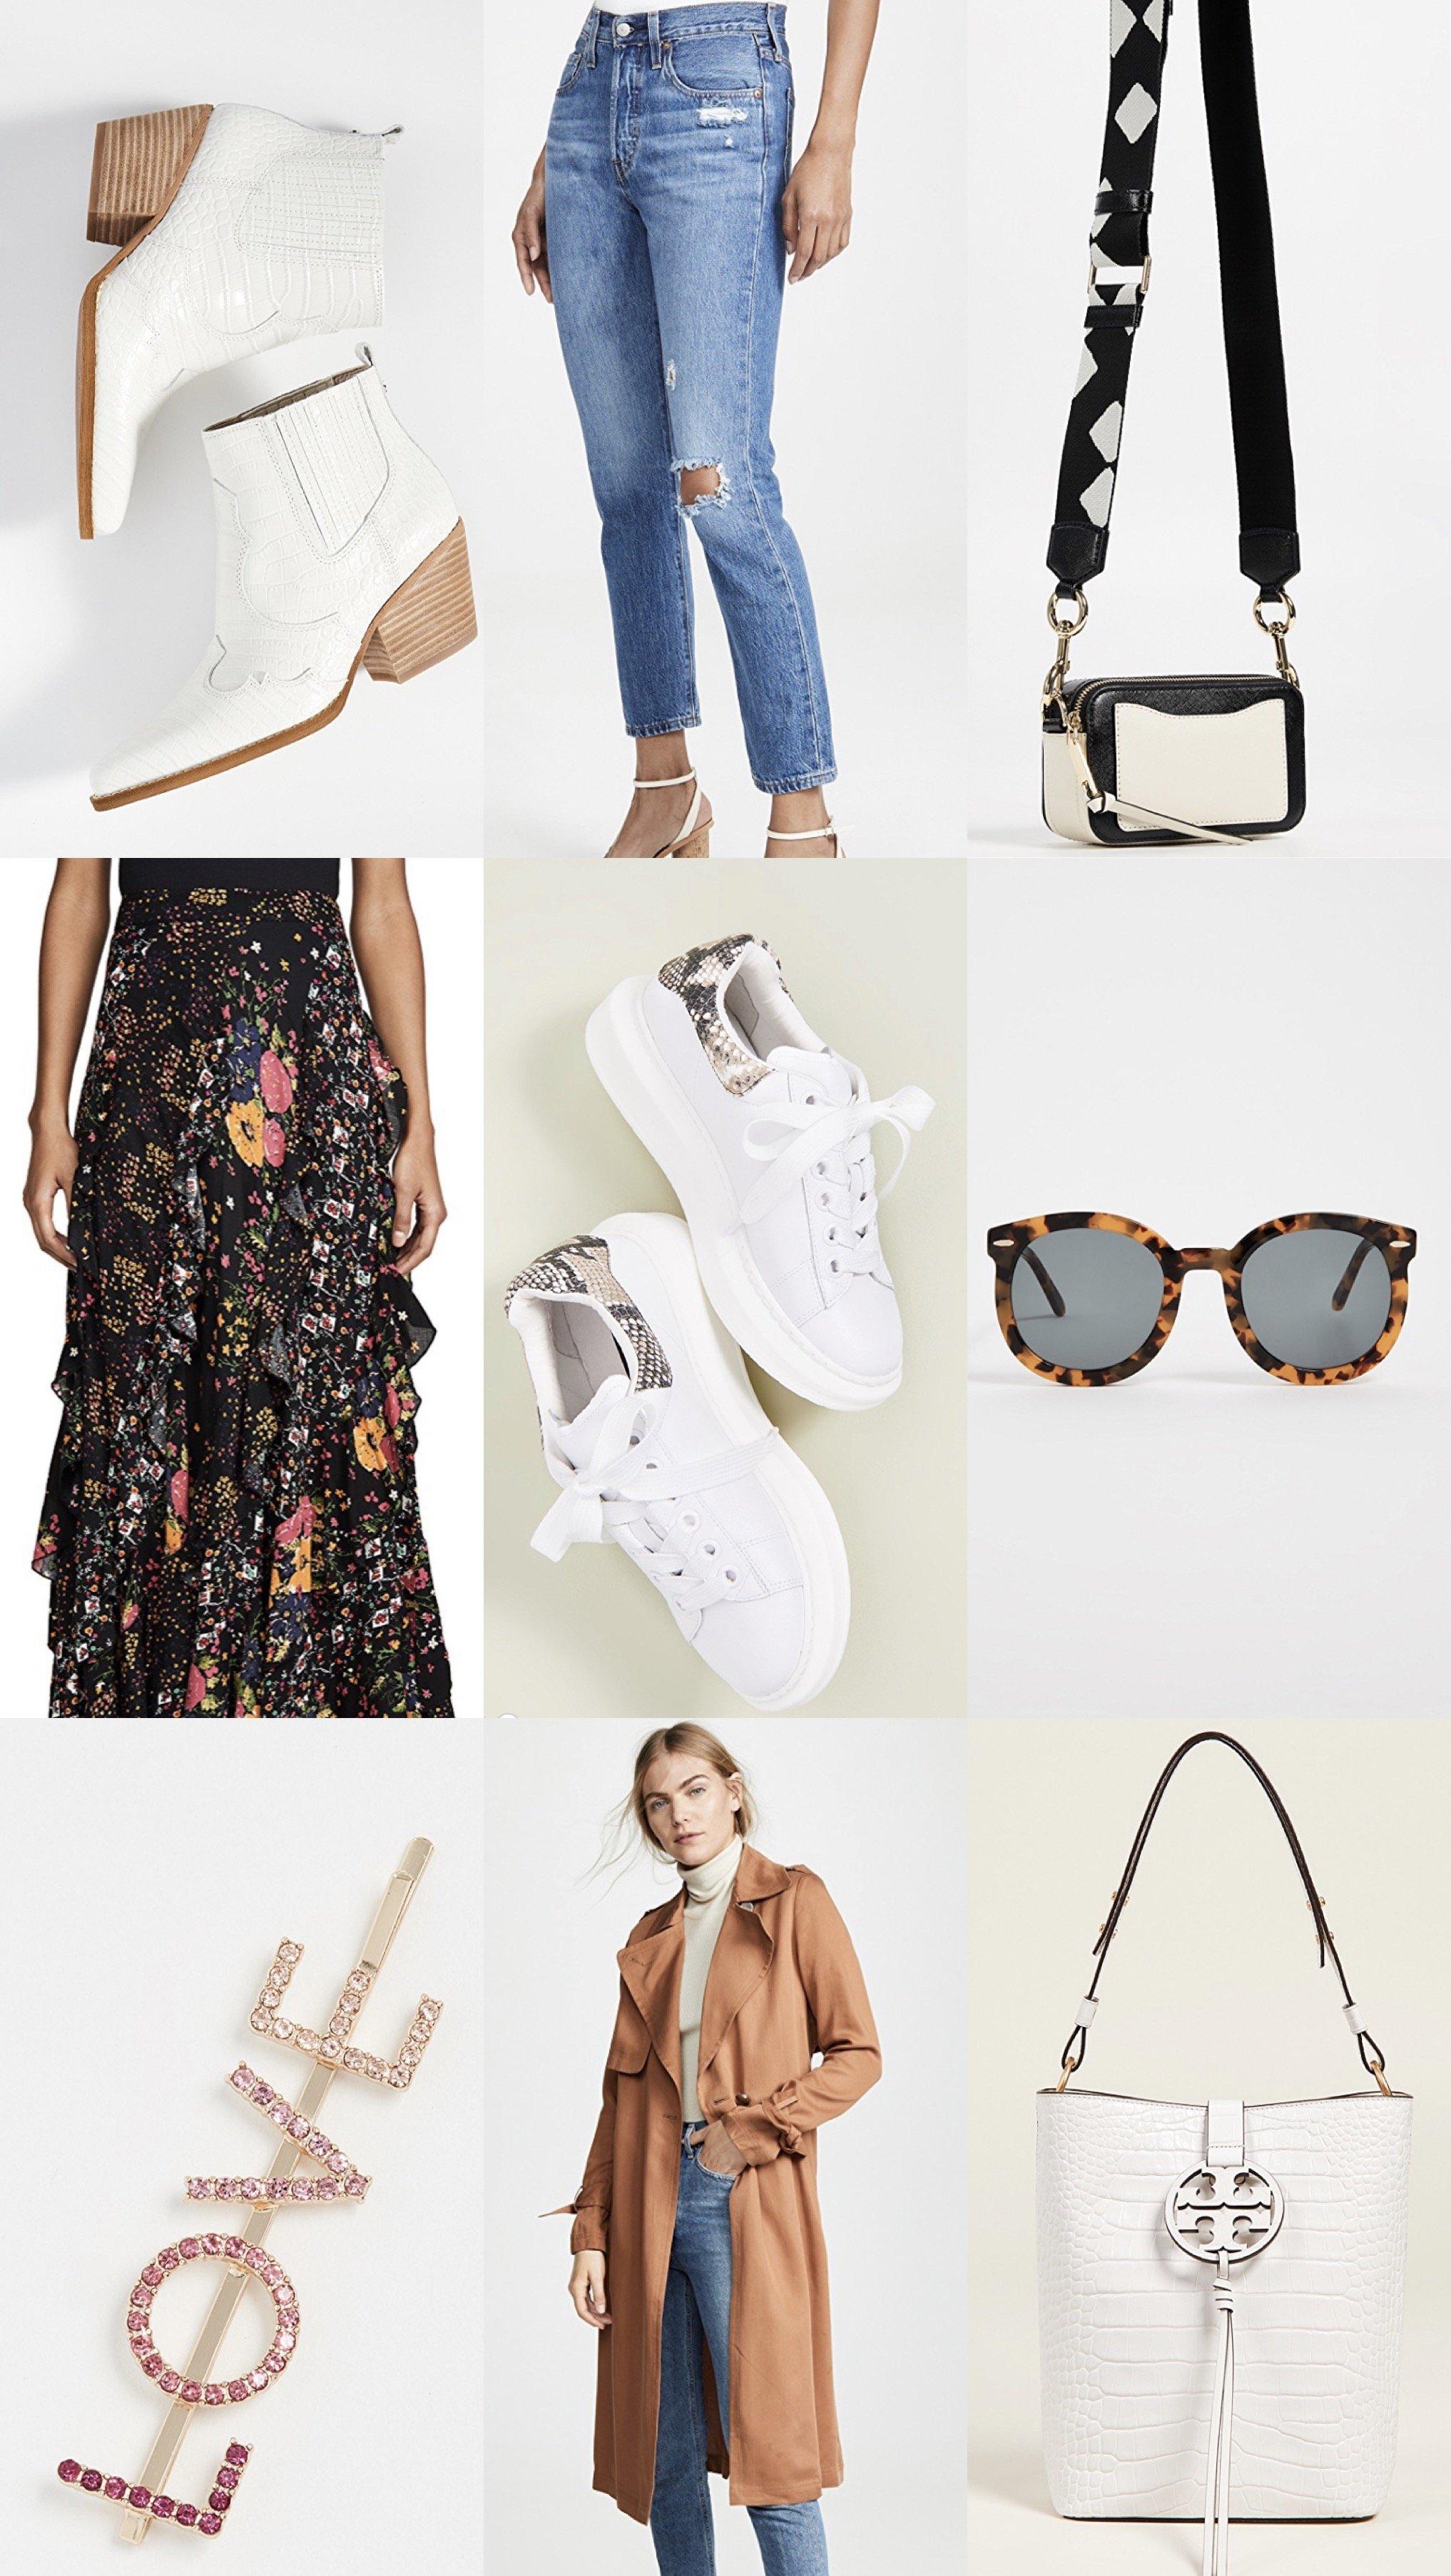 shopbop sale fall outfits